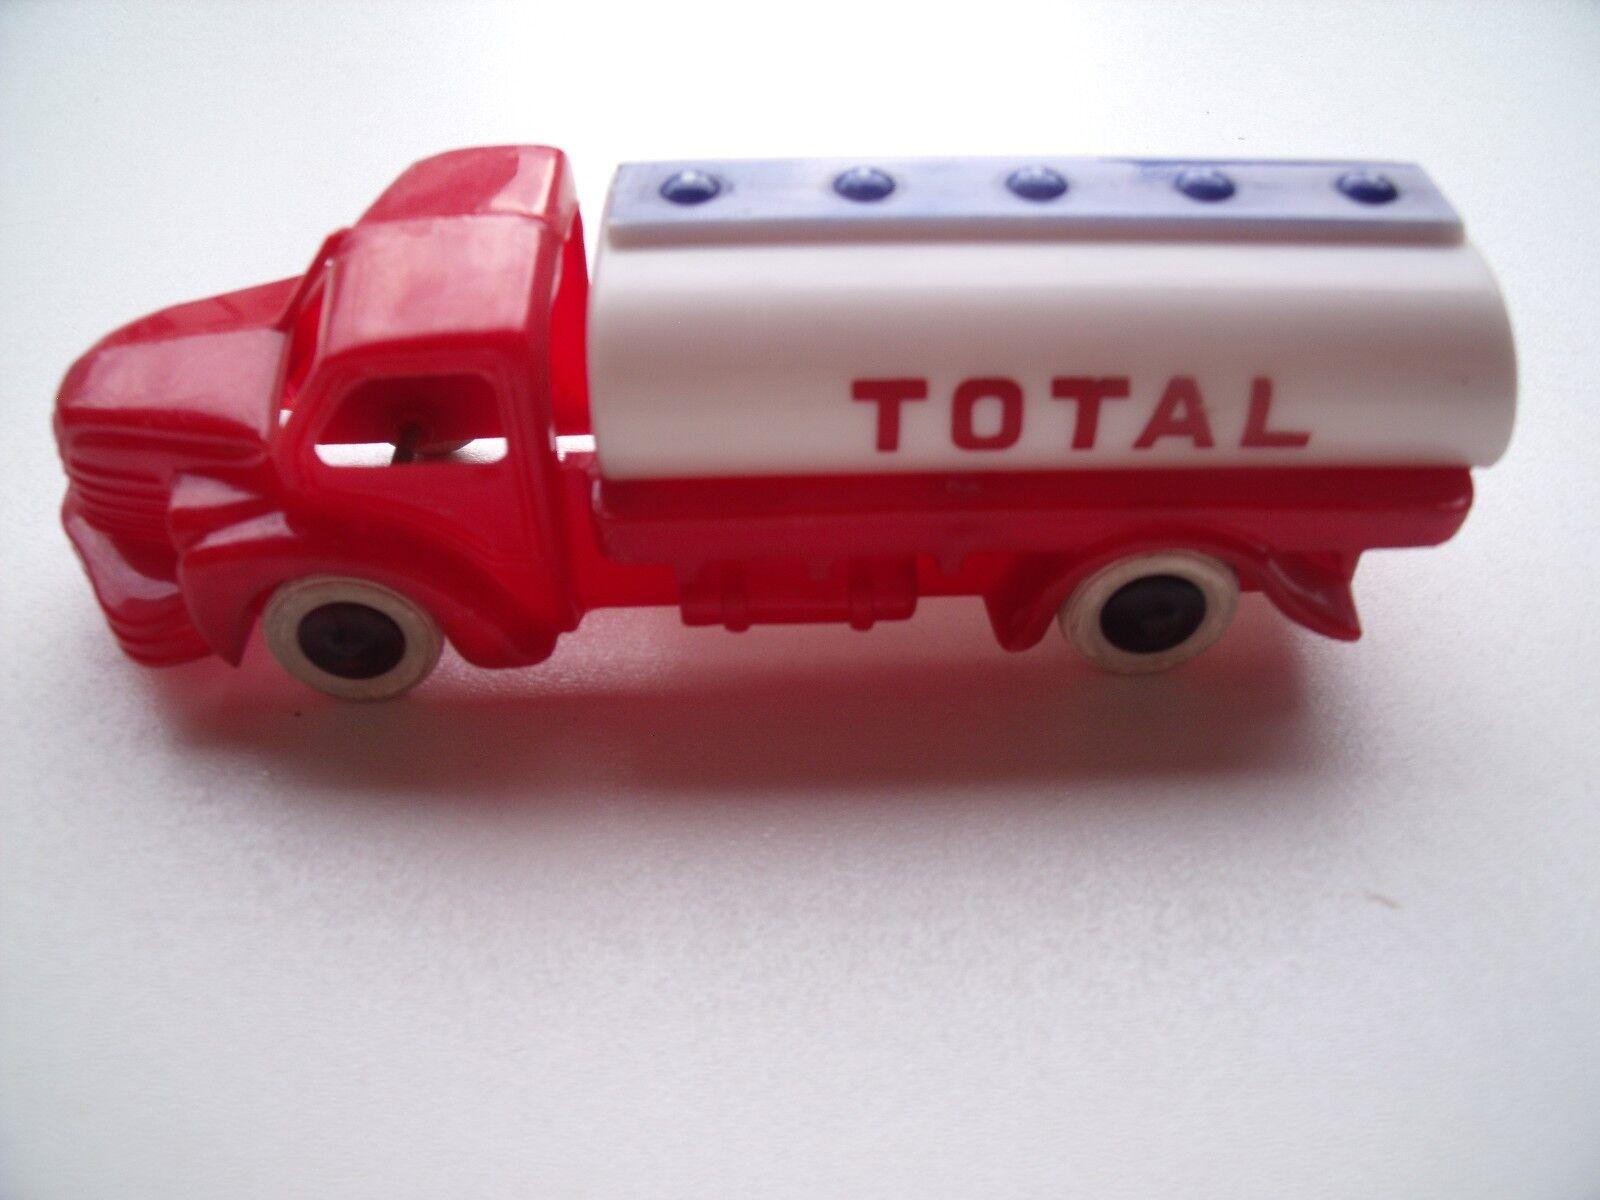 Rara Camion Serbatoio Petroliera Camion Bourbon Vape Berliet Totale Top